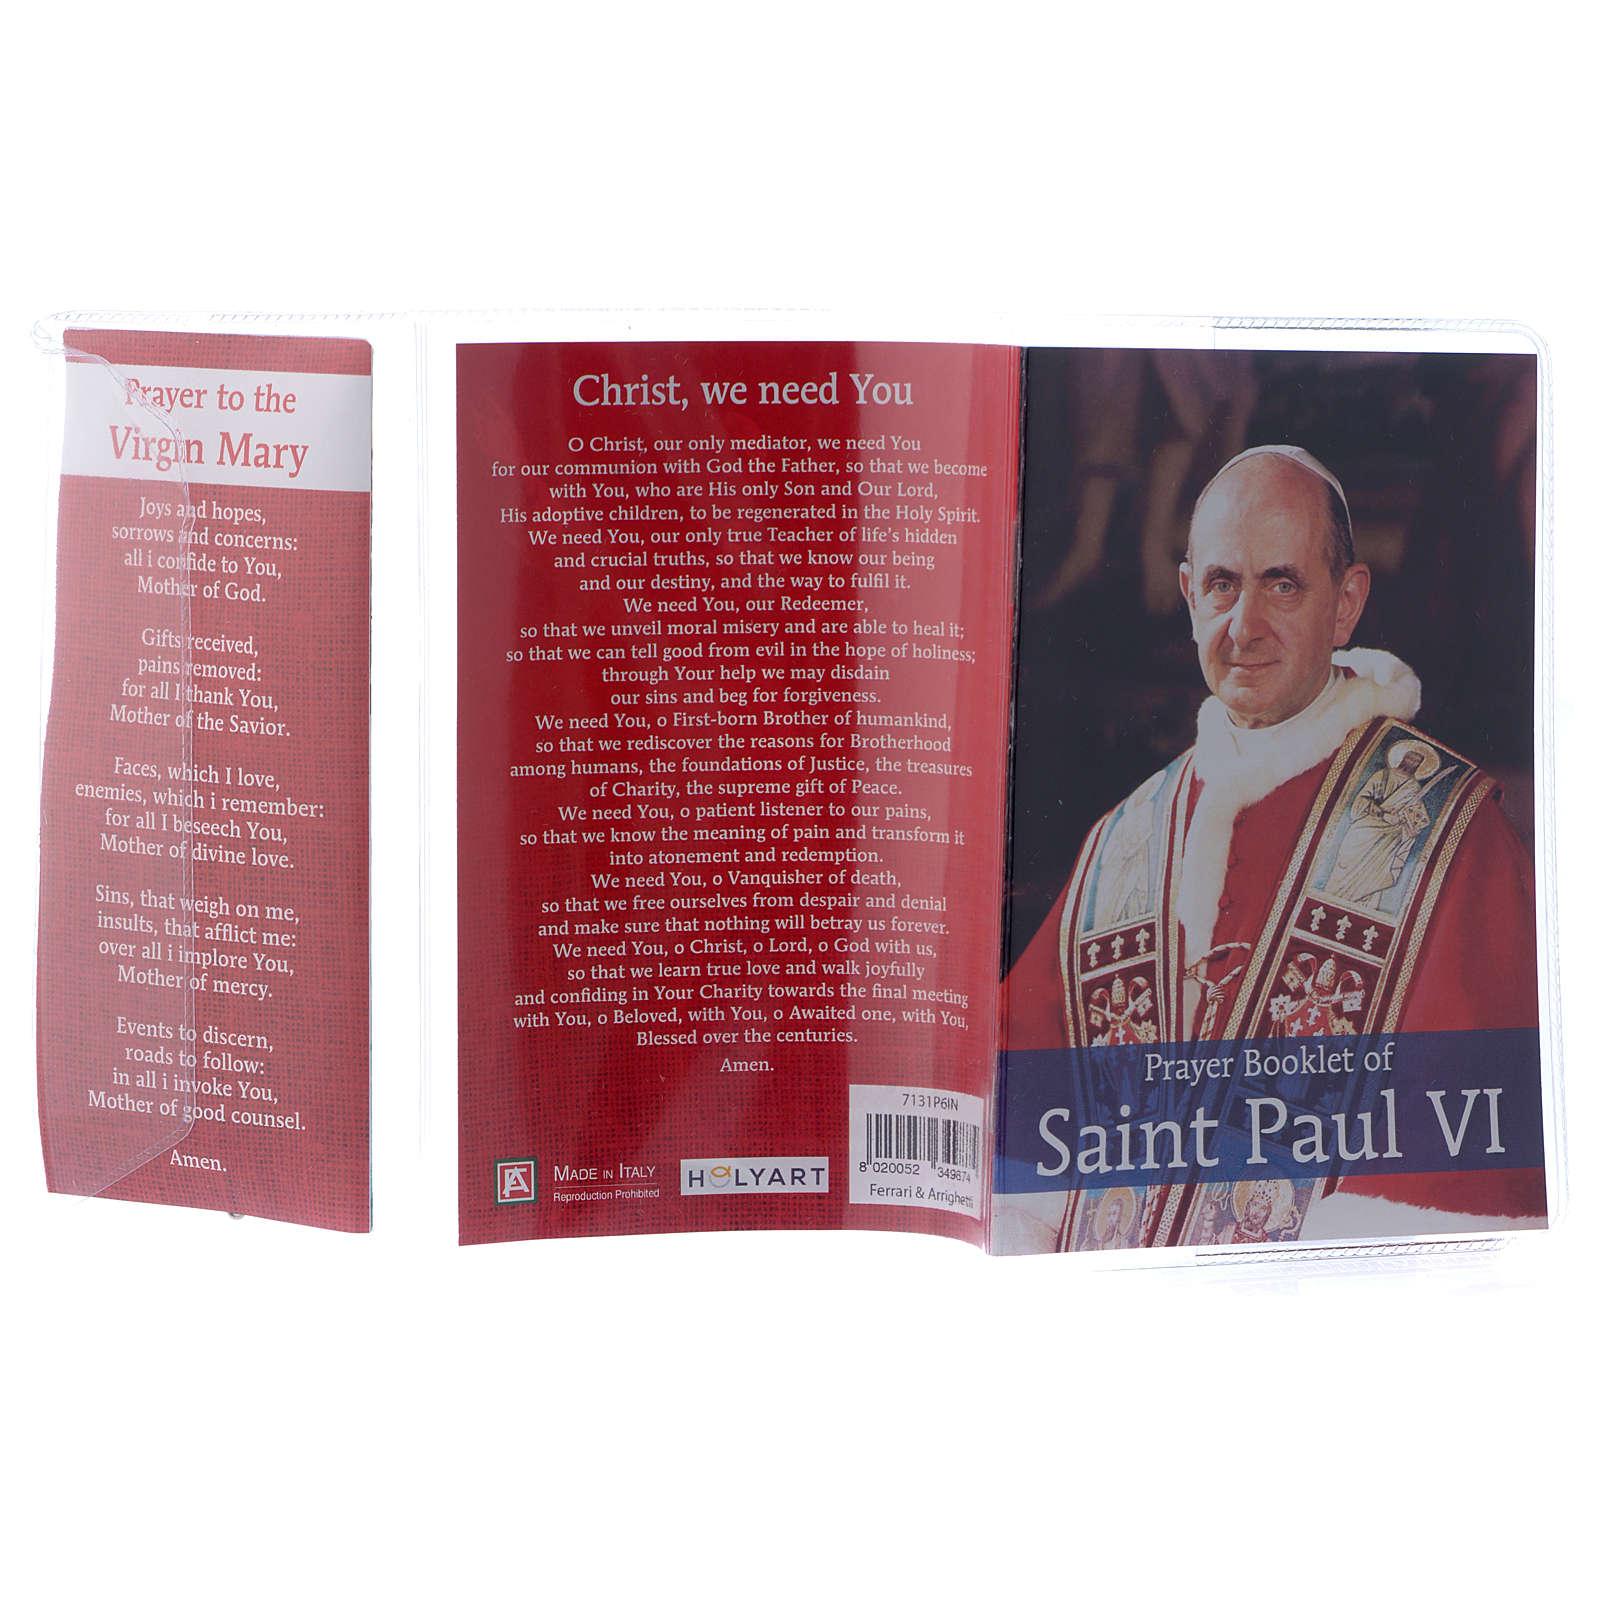 Prayer Booklet of Saint Paul VI - ENGLISH 4